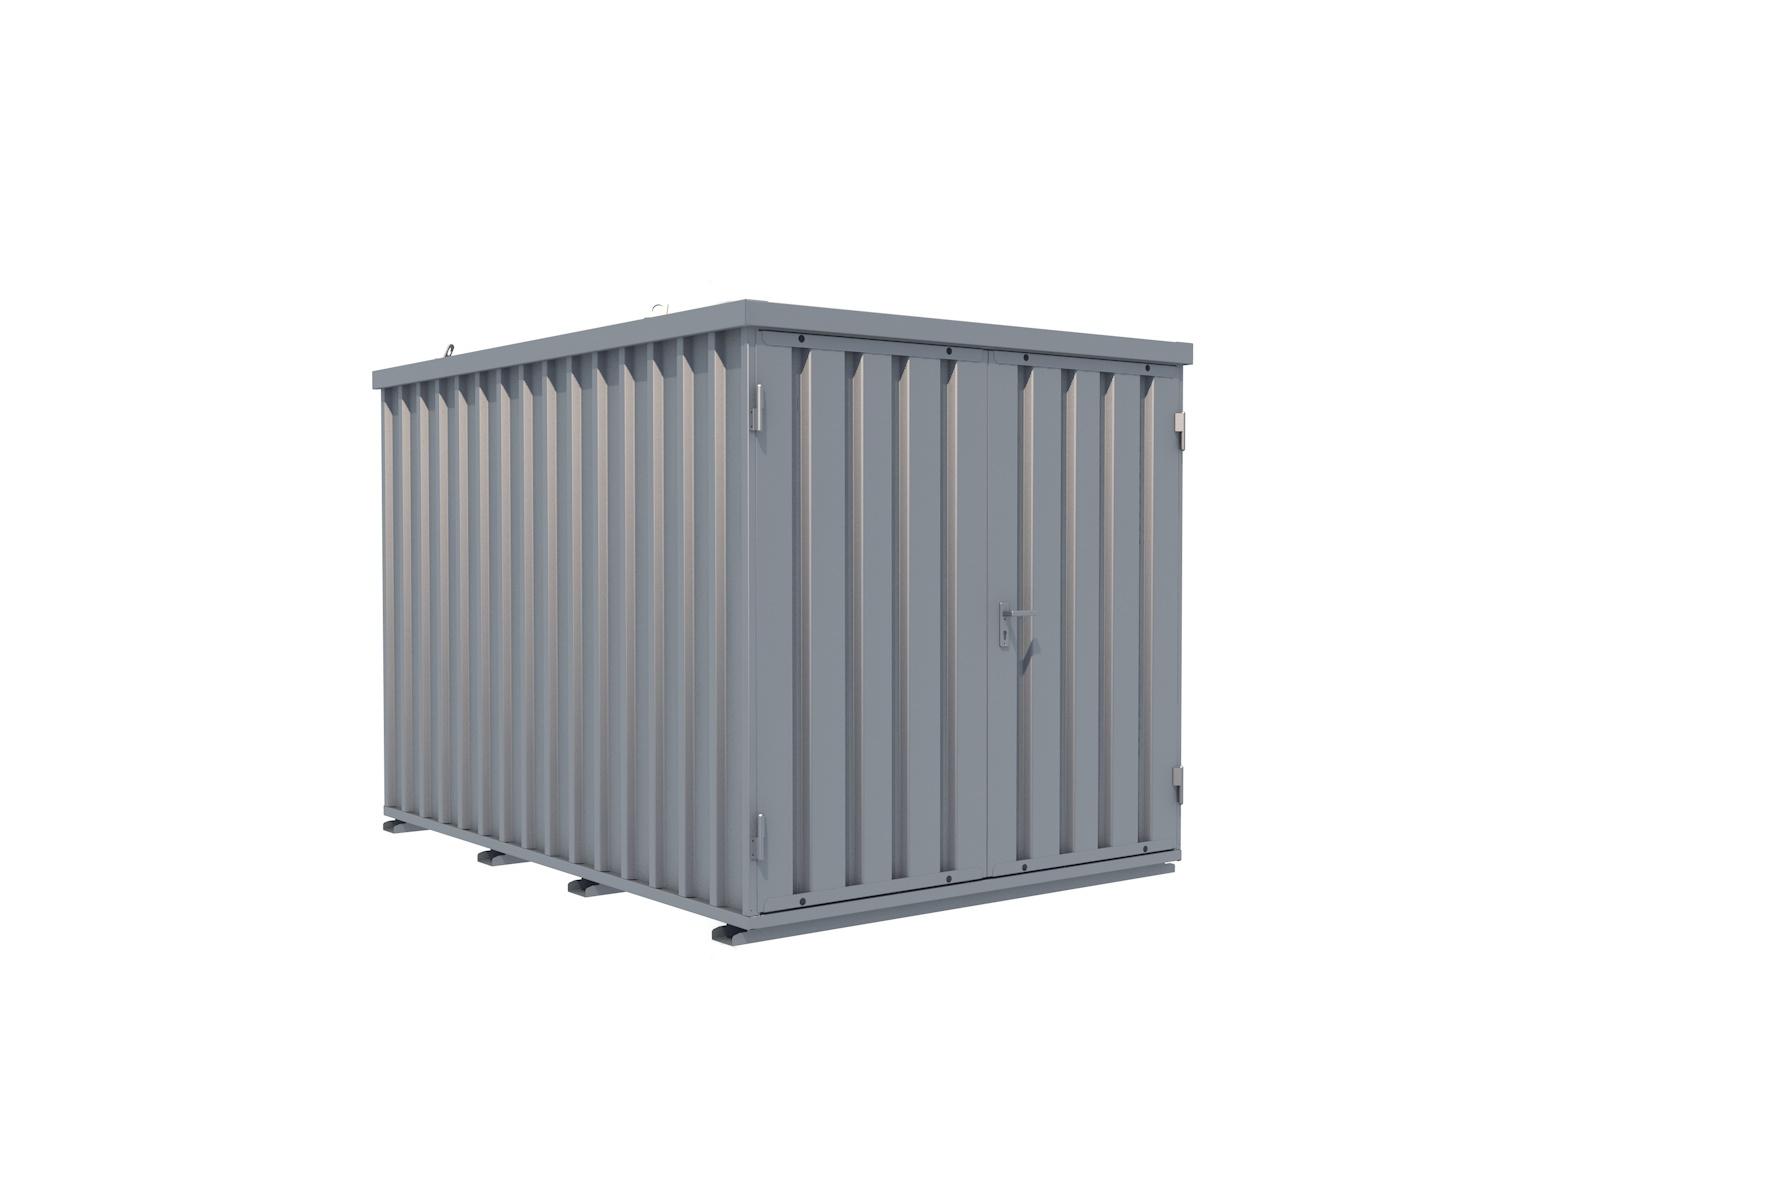 Baucontainer / Baustellencontainer / Schnellbaucontainer